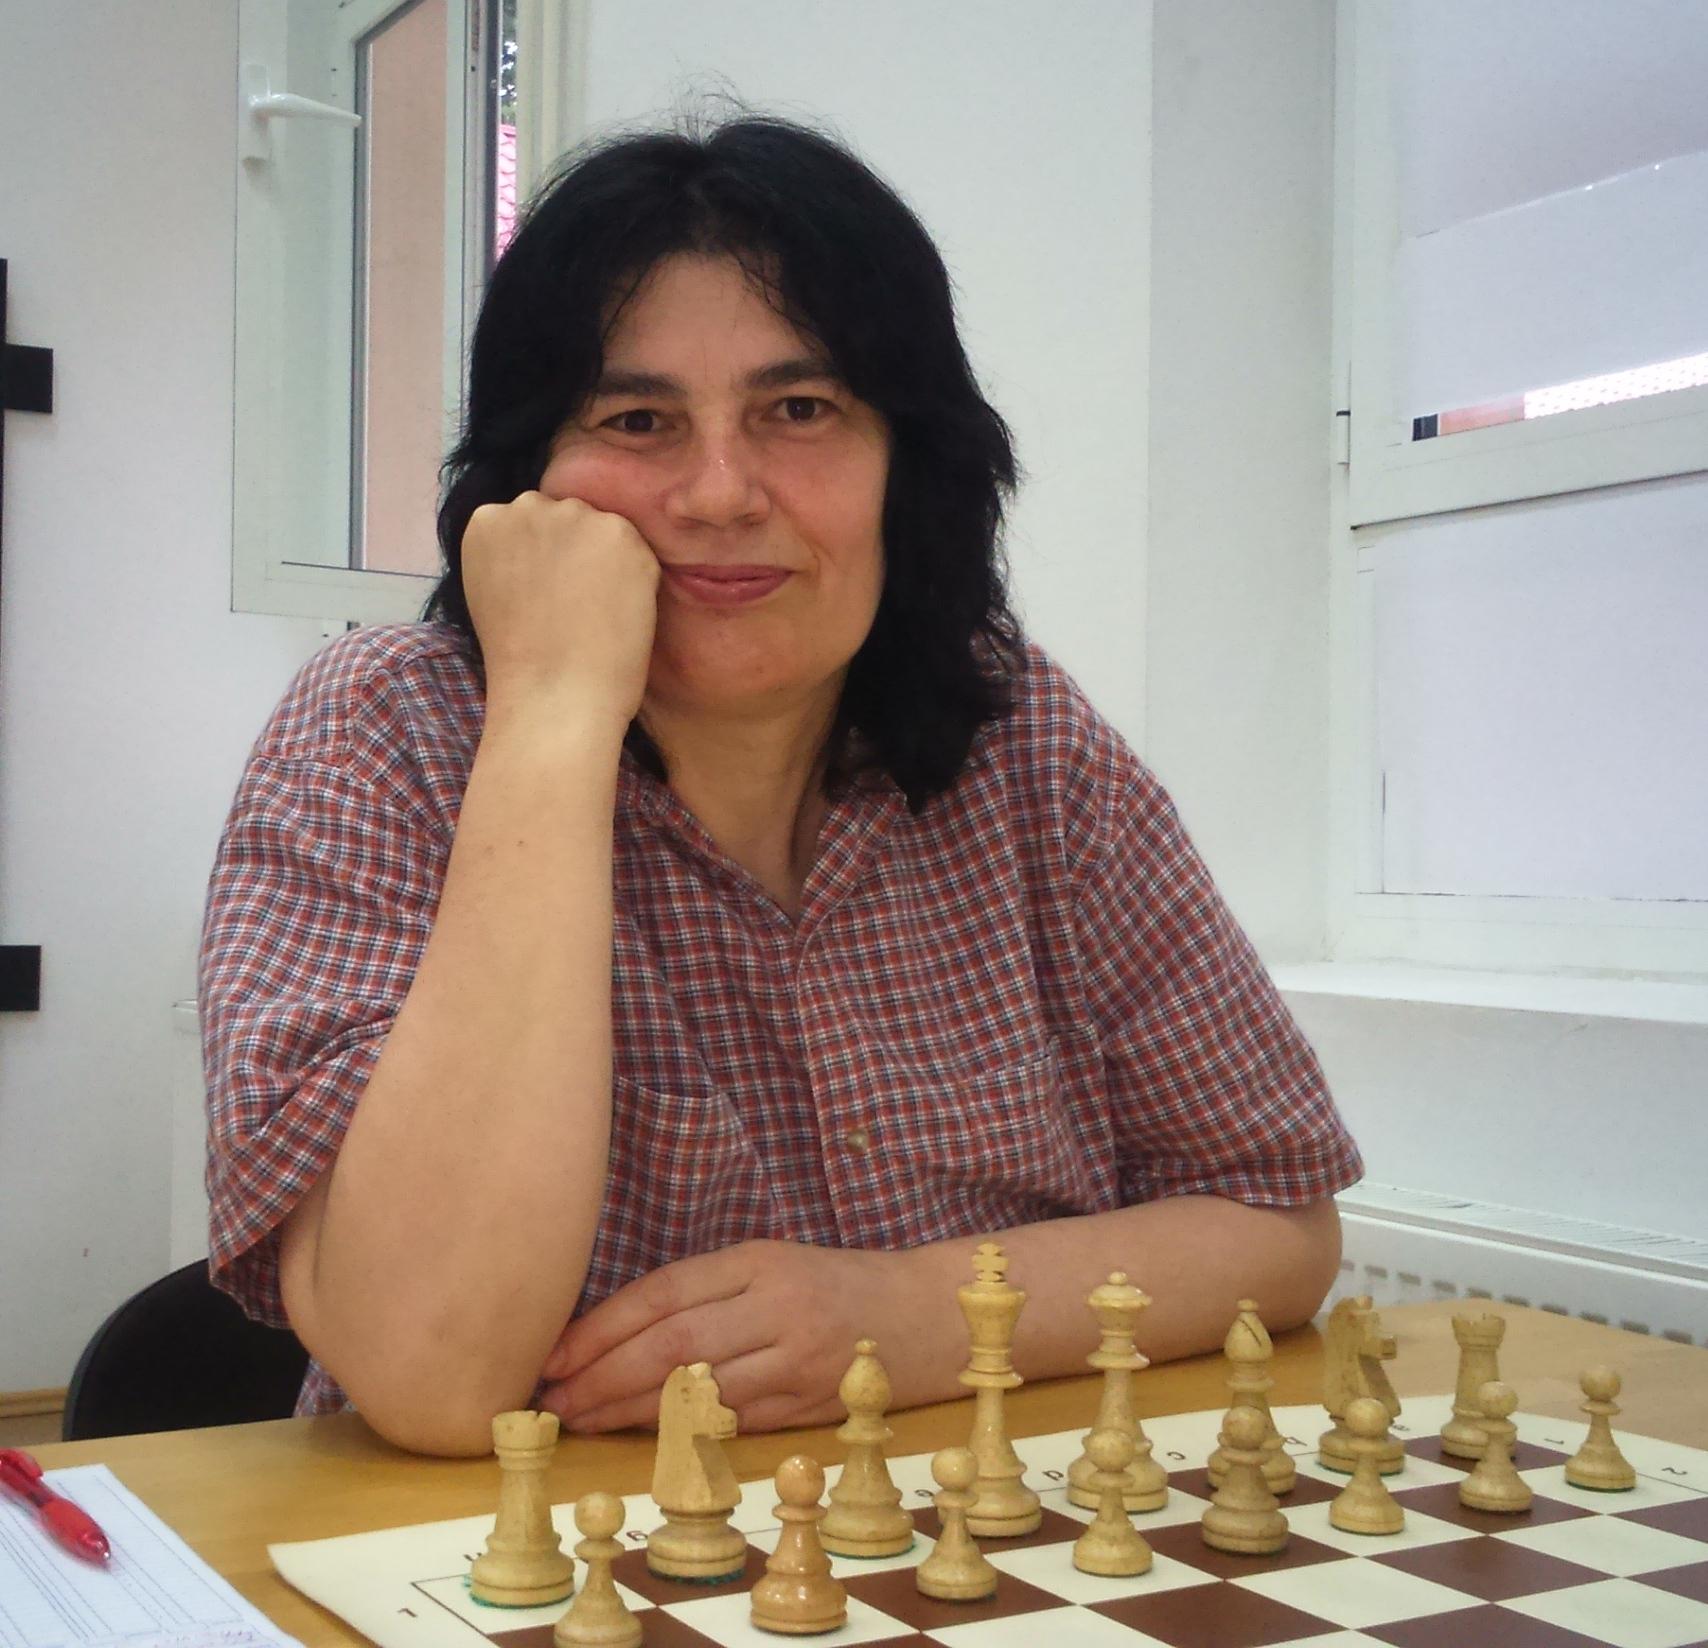 Lidija Blagojevic